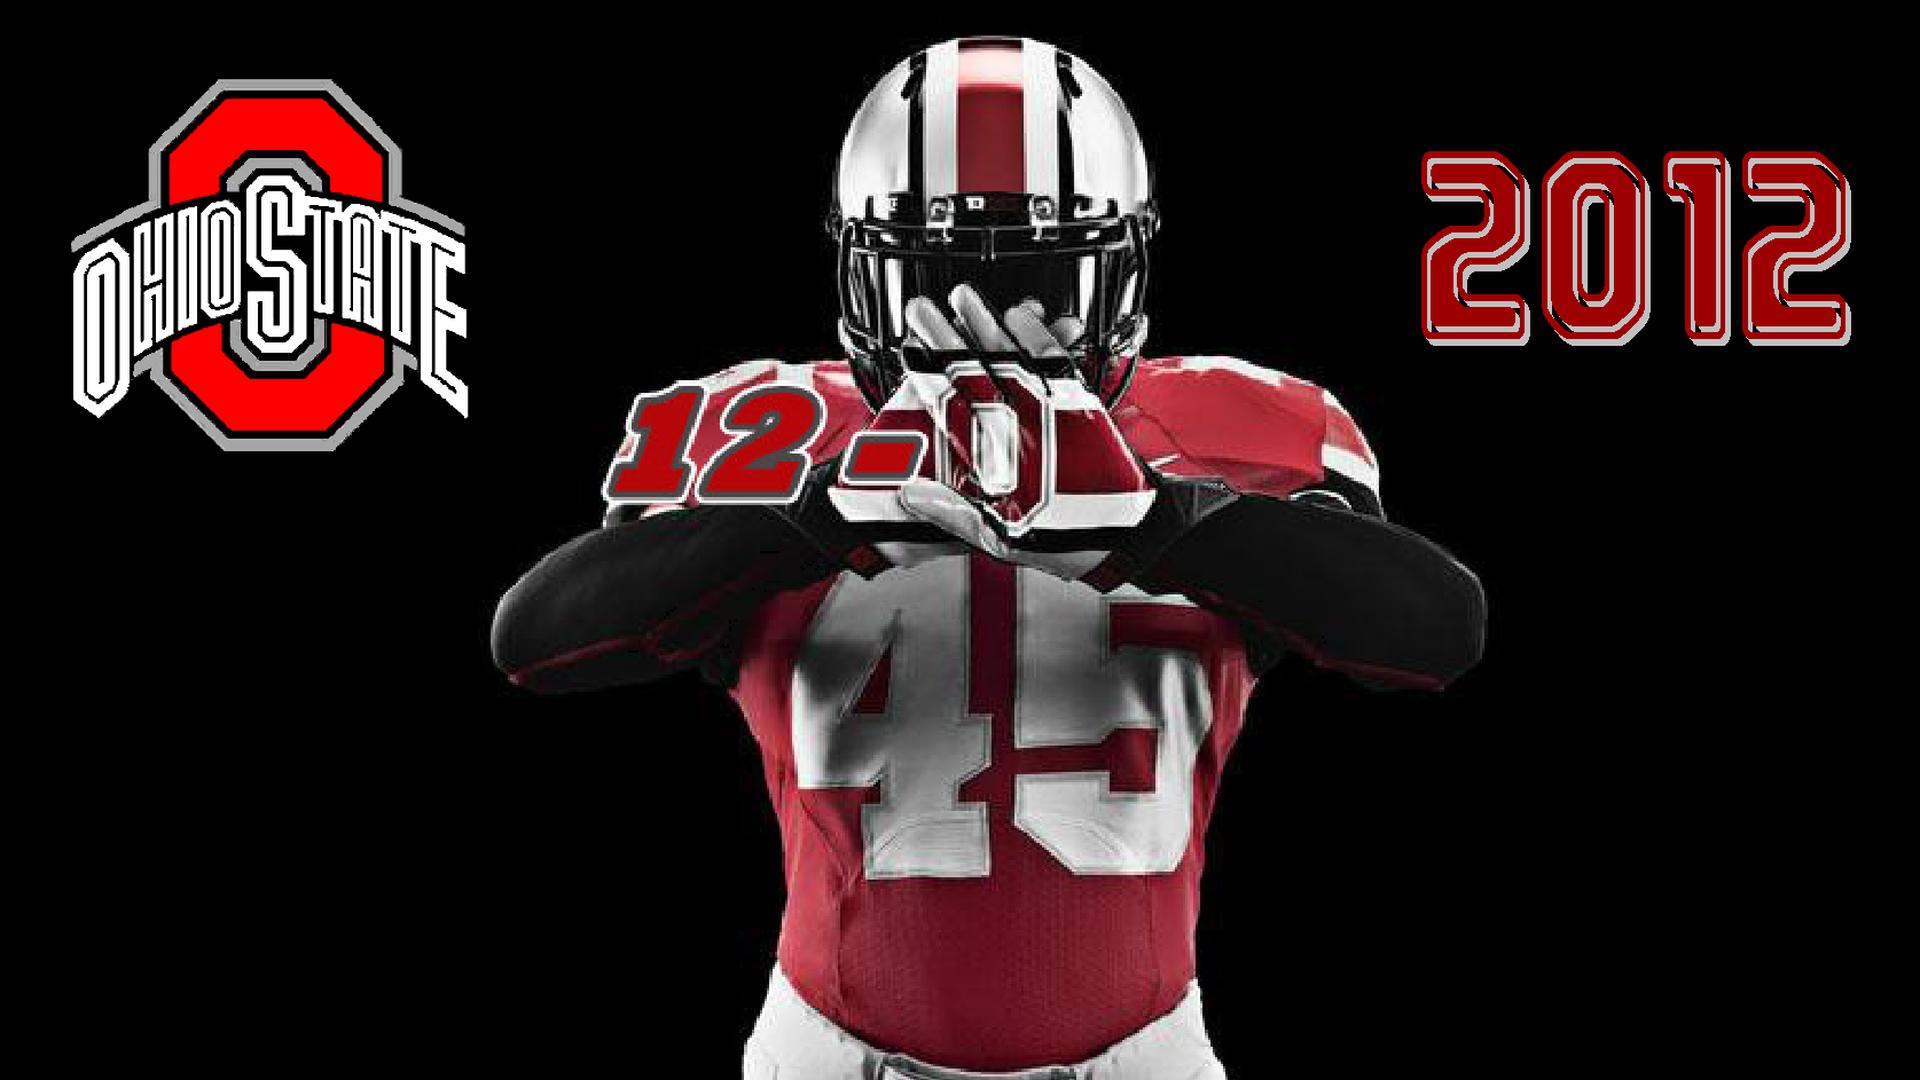 OHIO STATE 12-0 2012 - Ohio State Football Wallpaper ...